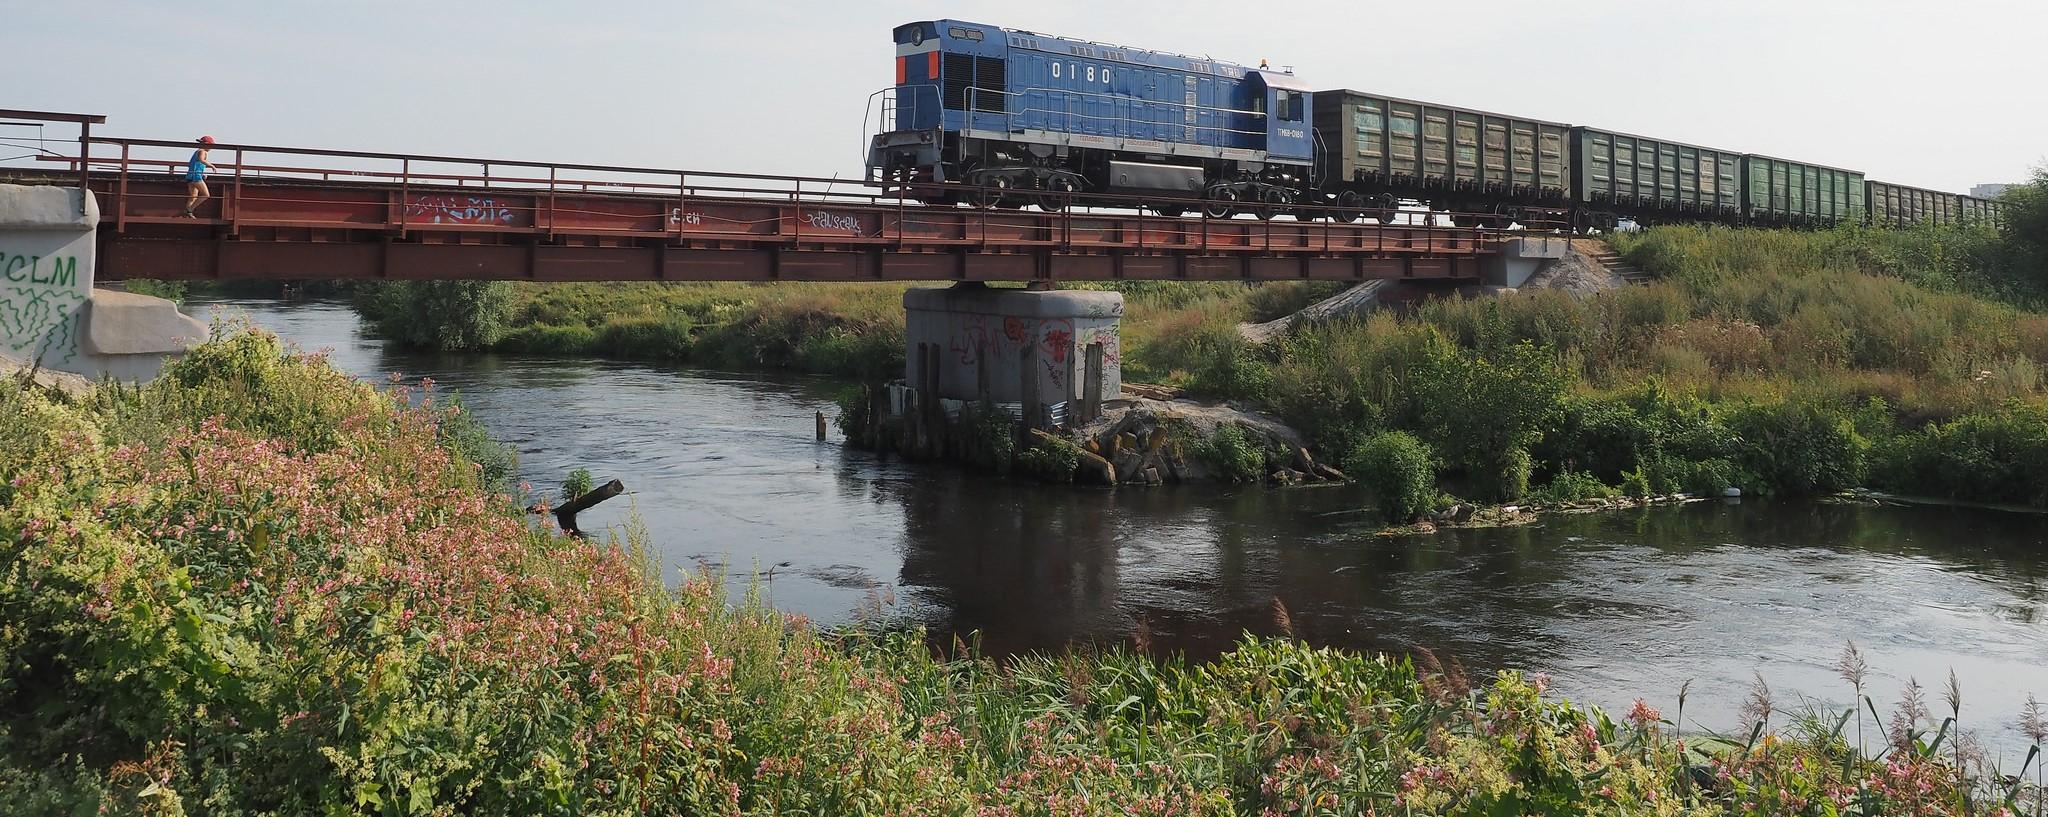 A freight train, Russia, August 2015 (Photo: Flickr/Artem Svetlov)